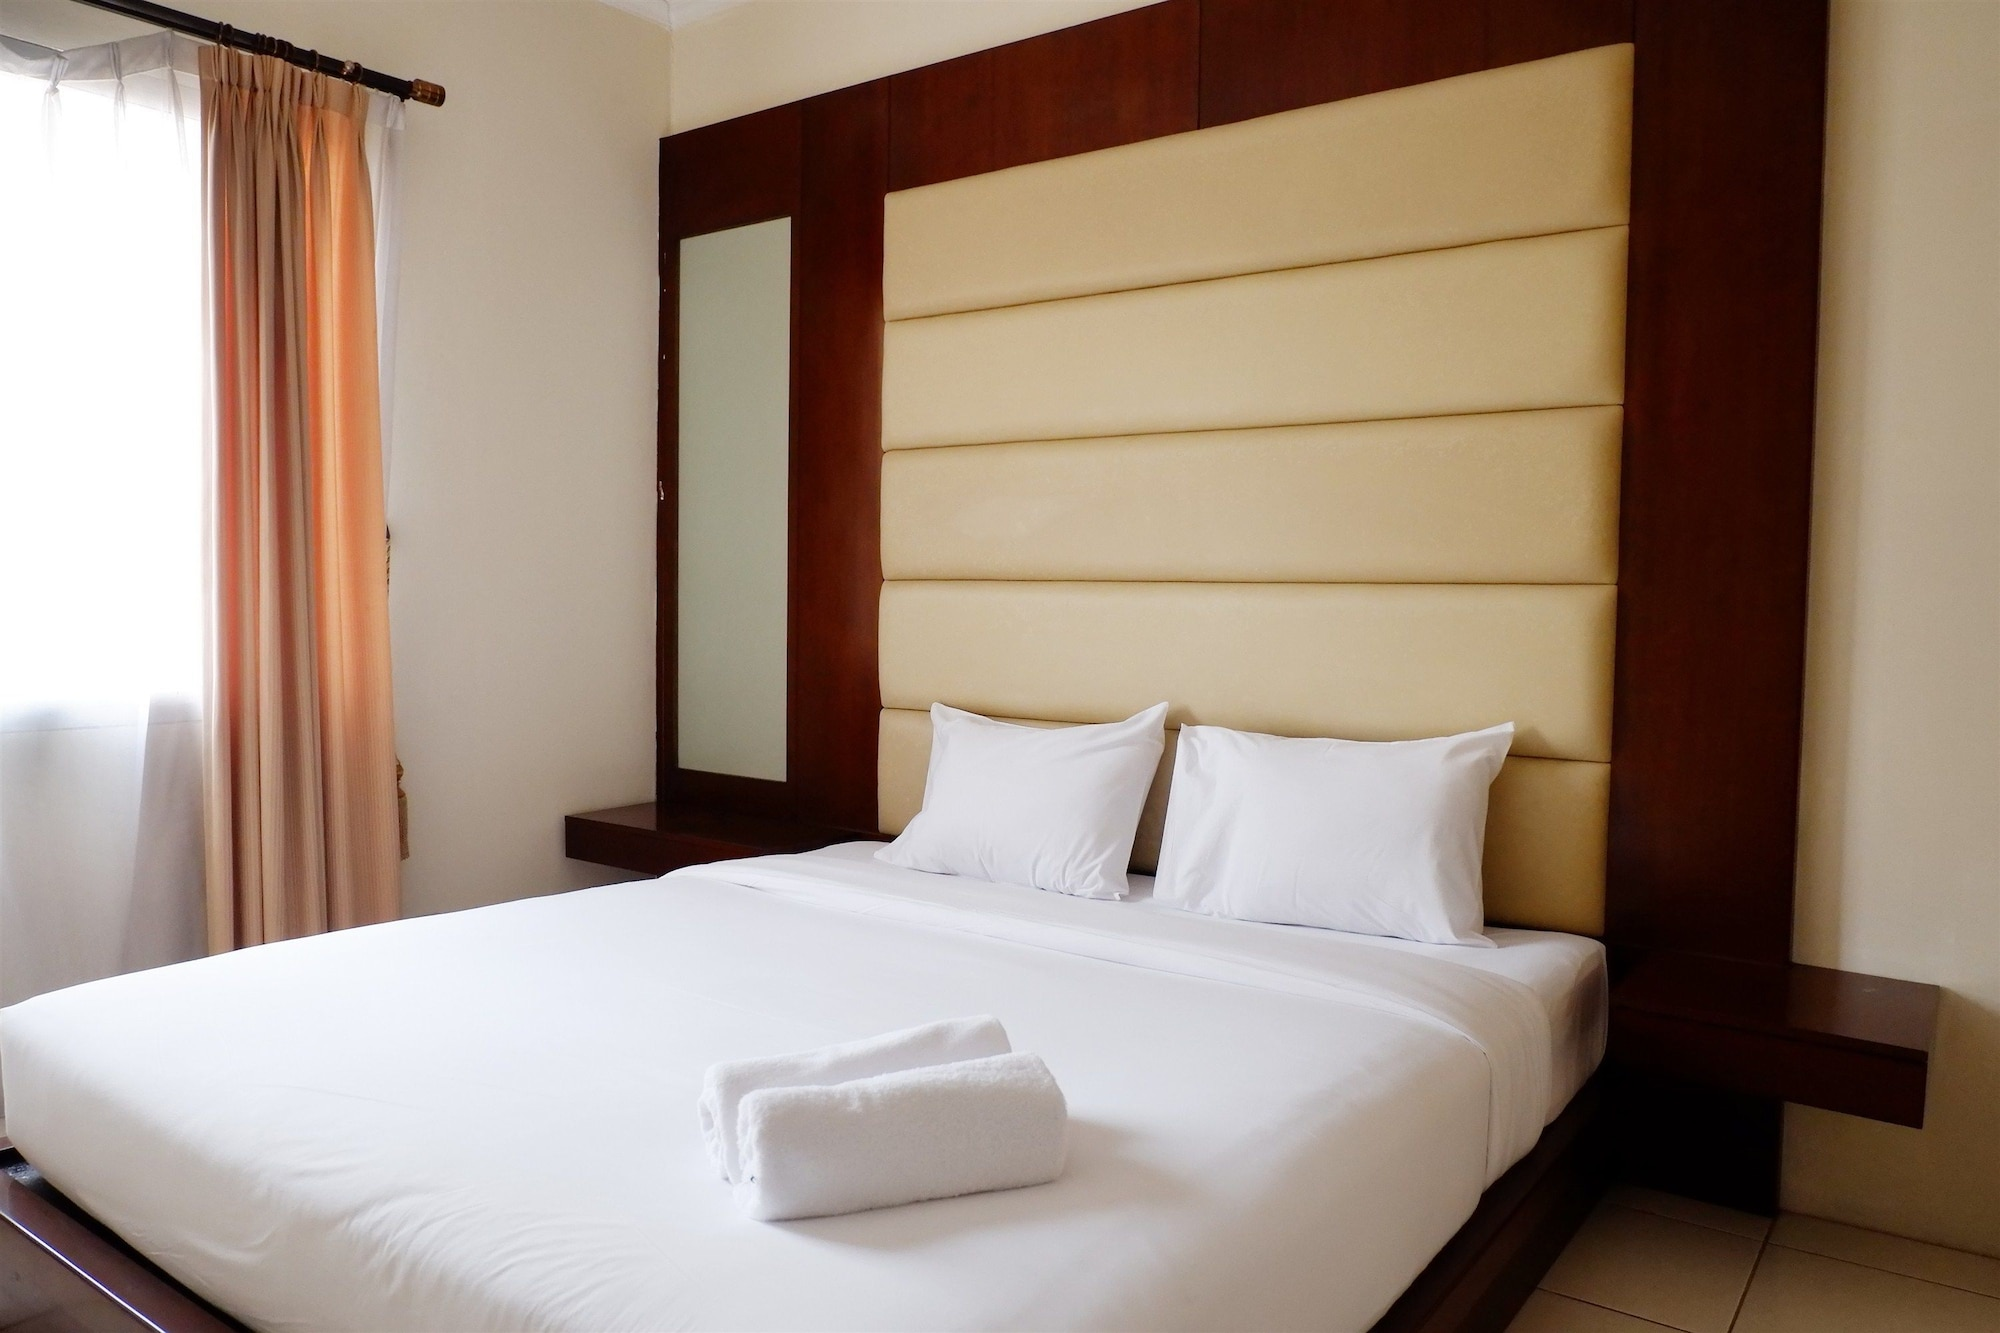 2BR Apartment with City View at Mediterania Marina Residences, Jakarta Utara